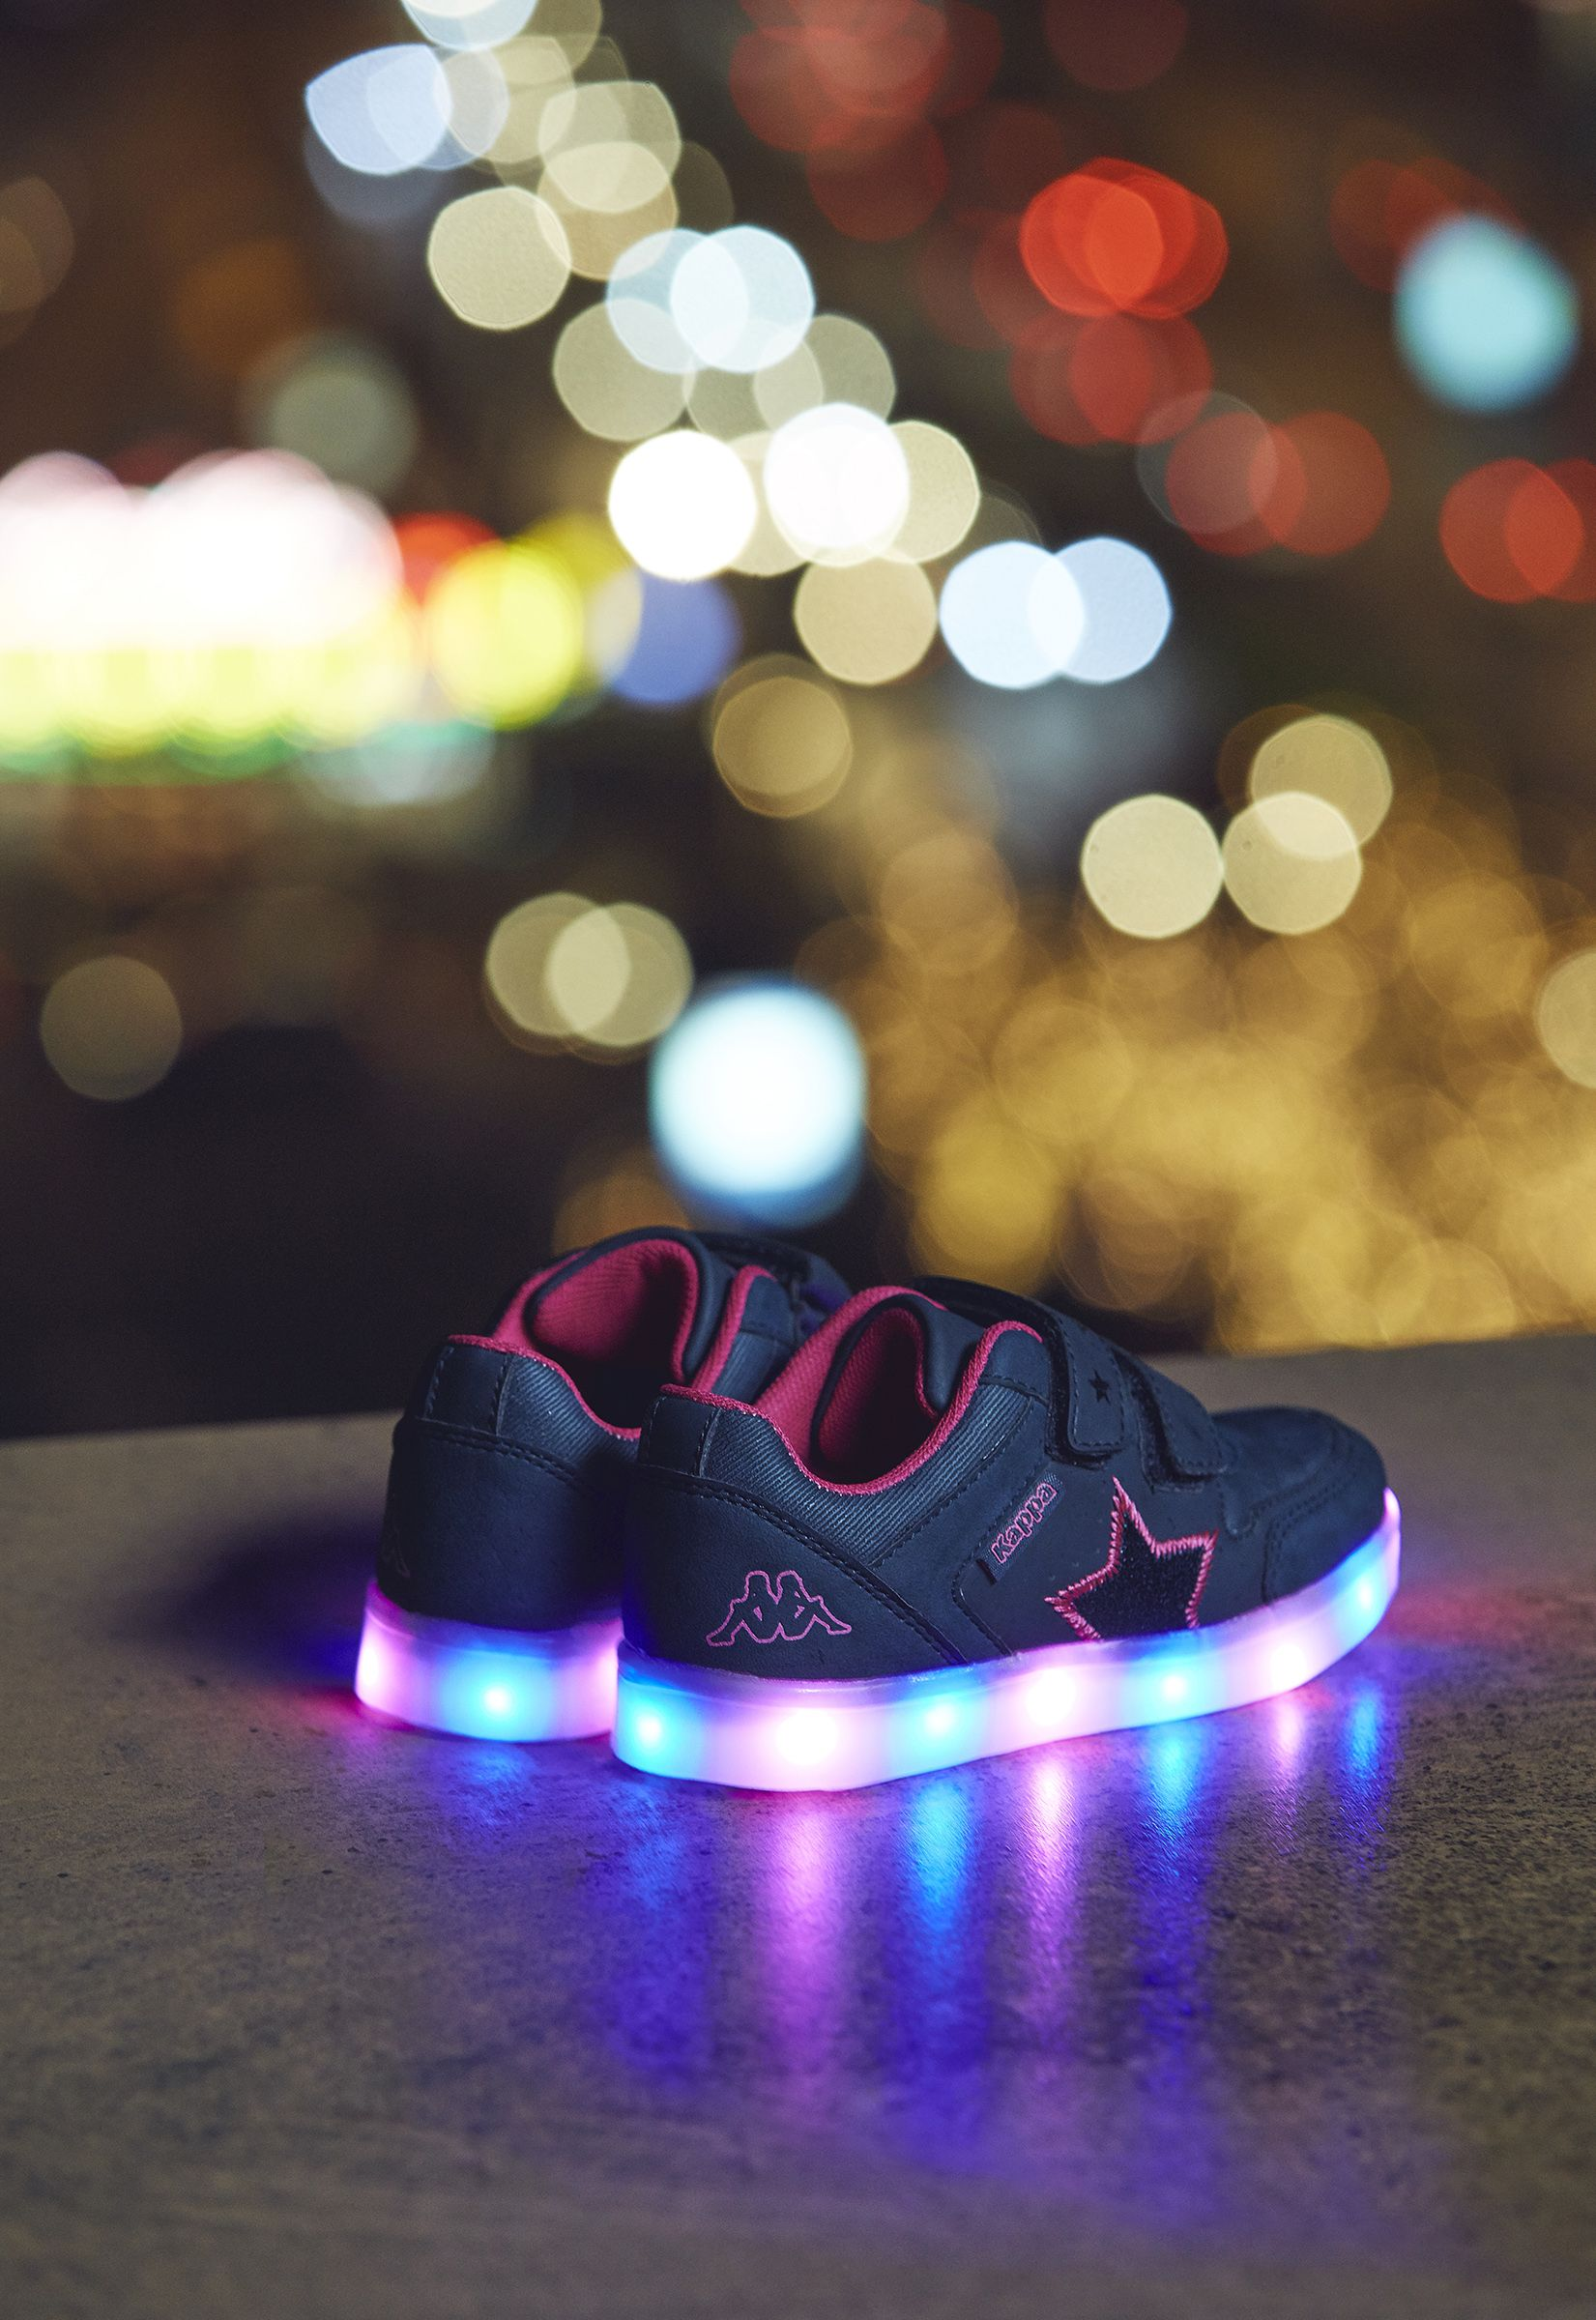 100% Spitzenqualität baby Schuhwerk Blinkschuhe für Kids Modell: Aquila   Kappa Kids   Shoes ...